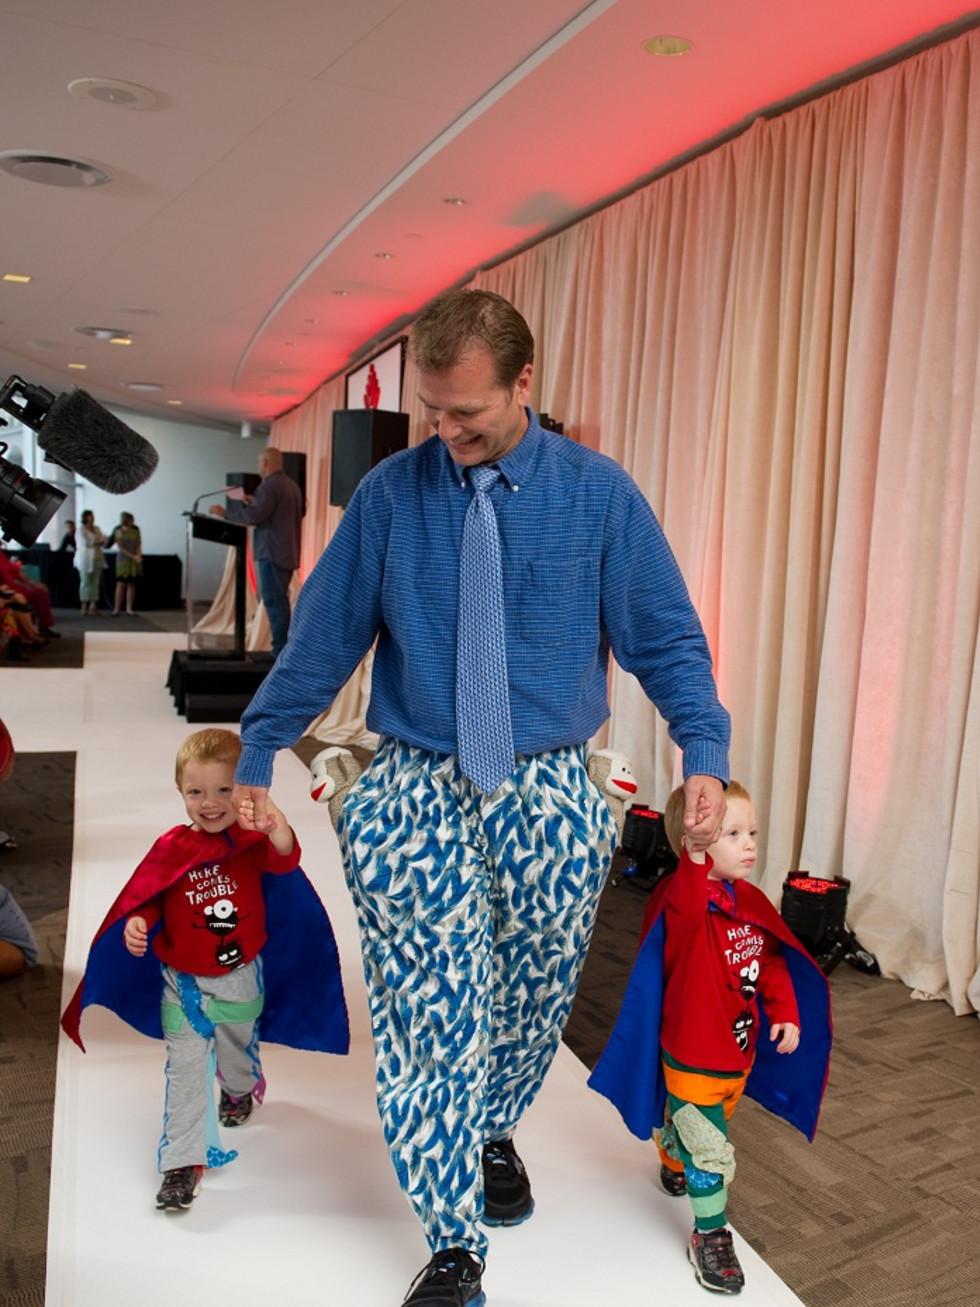 Bad Pants Fashion Show, Ned Hibberd, Alexander Hibberd, Michael Hibbard, Texas Children's Hospital, 2012